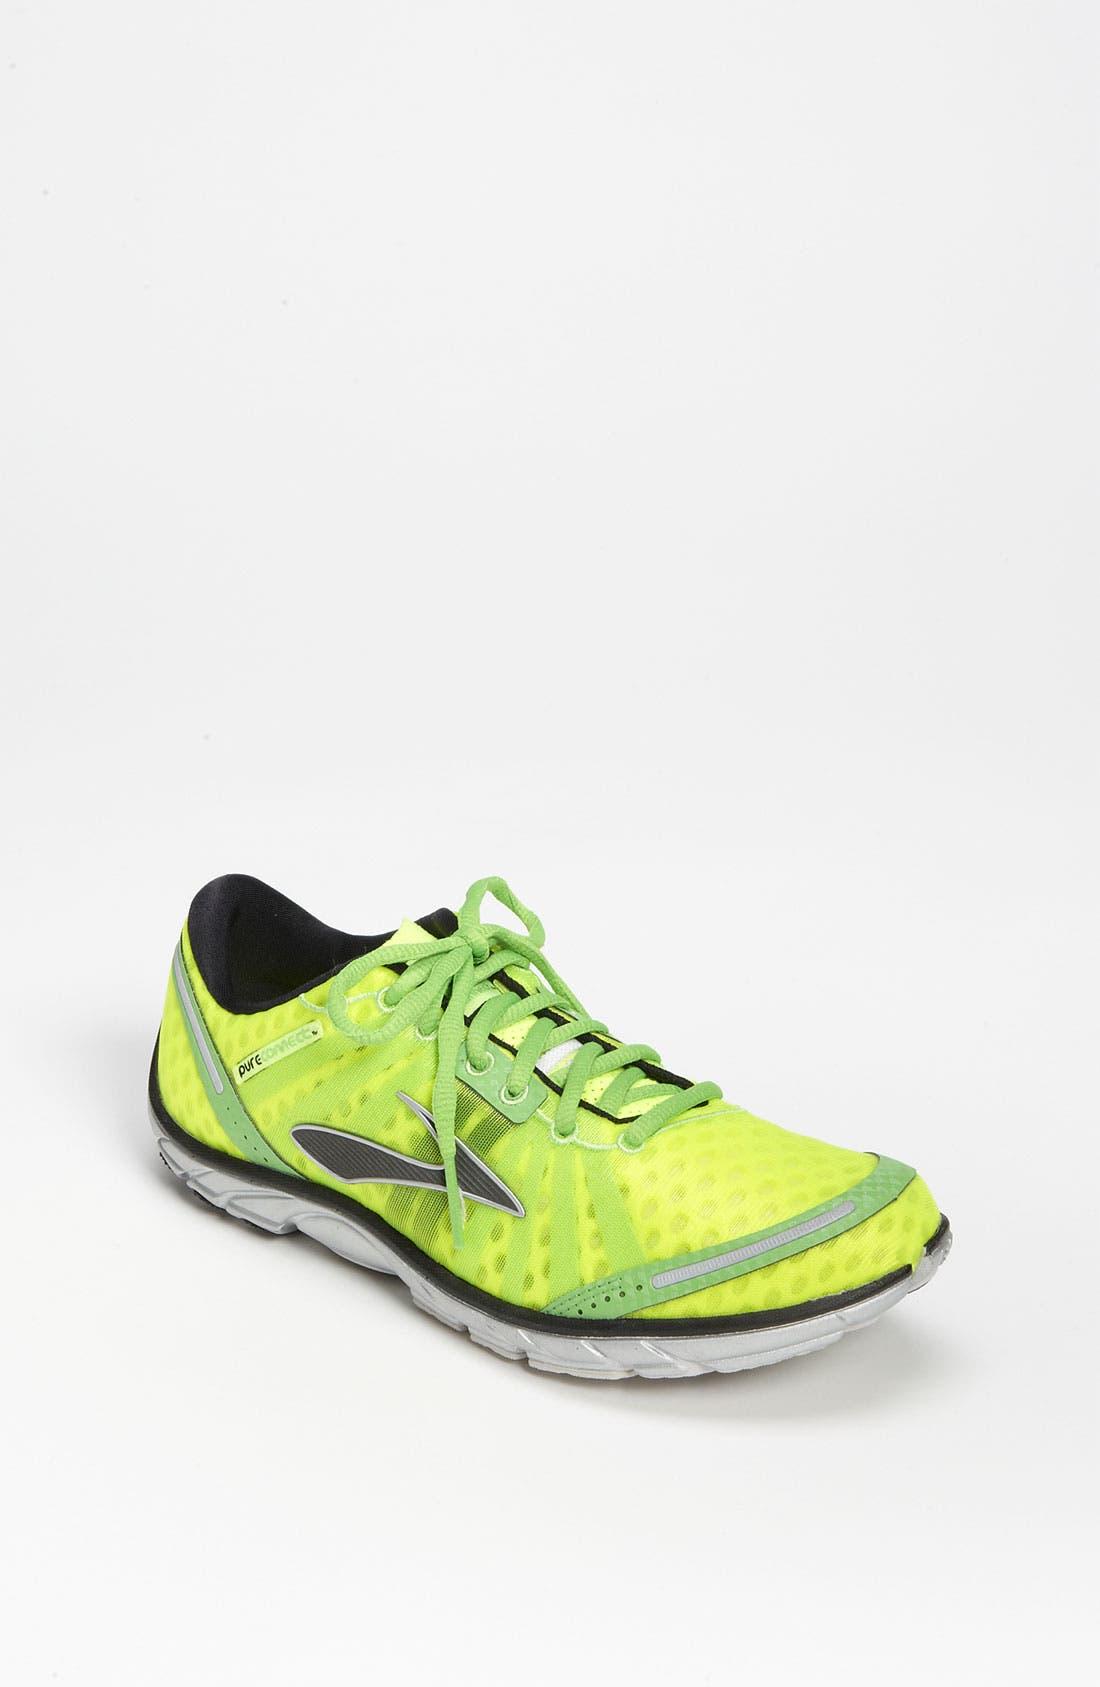 Alternate Image 1 Selected - Brooks 'PureConnect' Running Shoe (Women) (Regular Retail Price: $89.95)